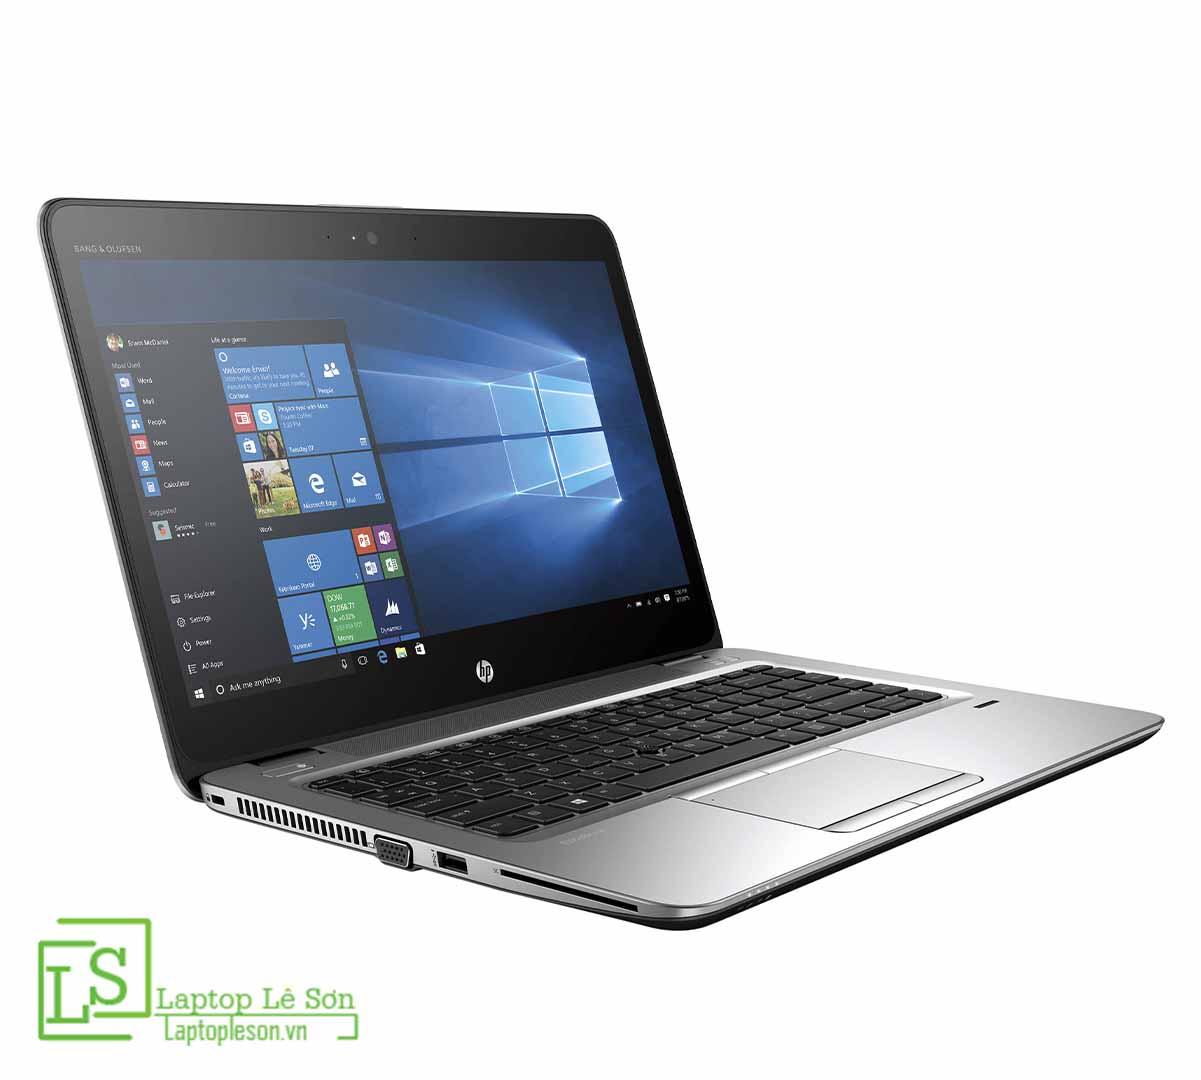 2. HP Elitebook 840 G3 - Laptop core i5 tầm giá 10 triệu hãng HP